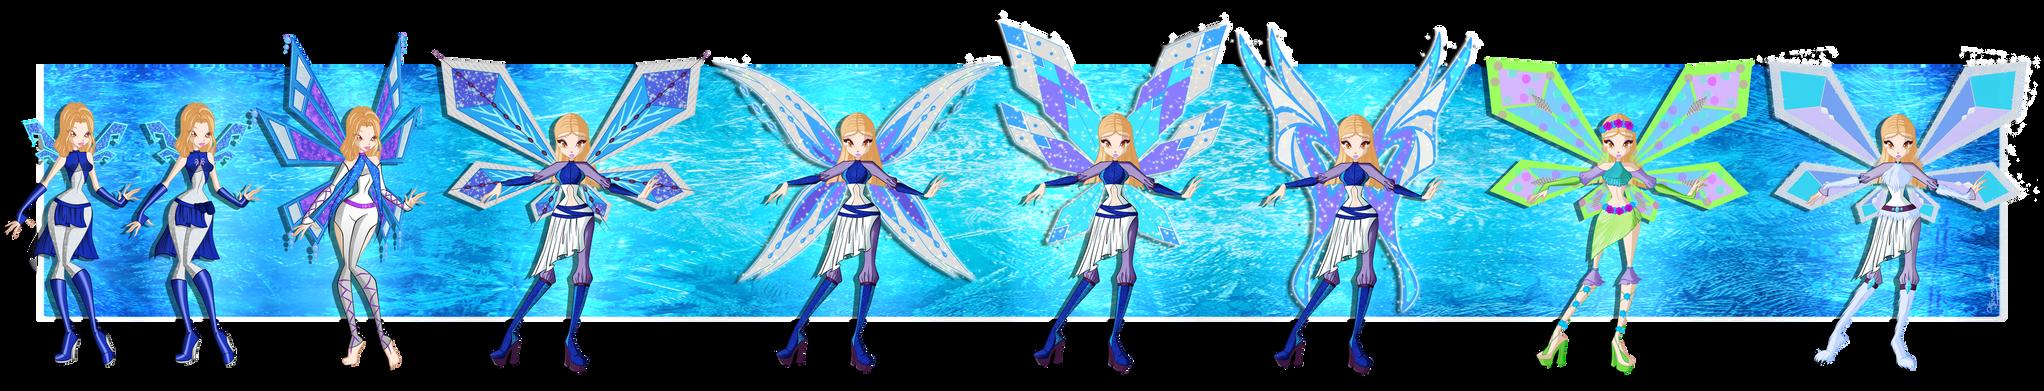 [WC][C]:|Hilda S1-S4 Fairy Evolution|